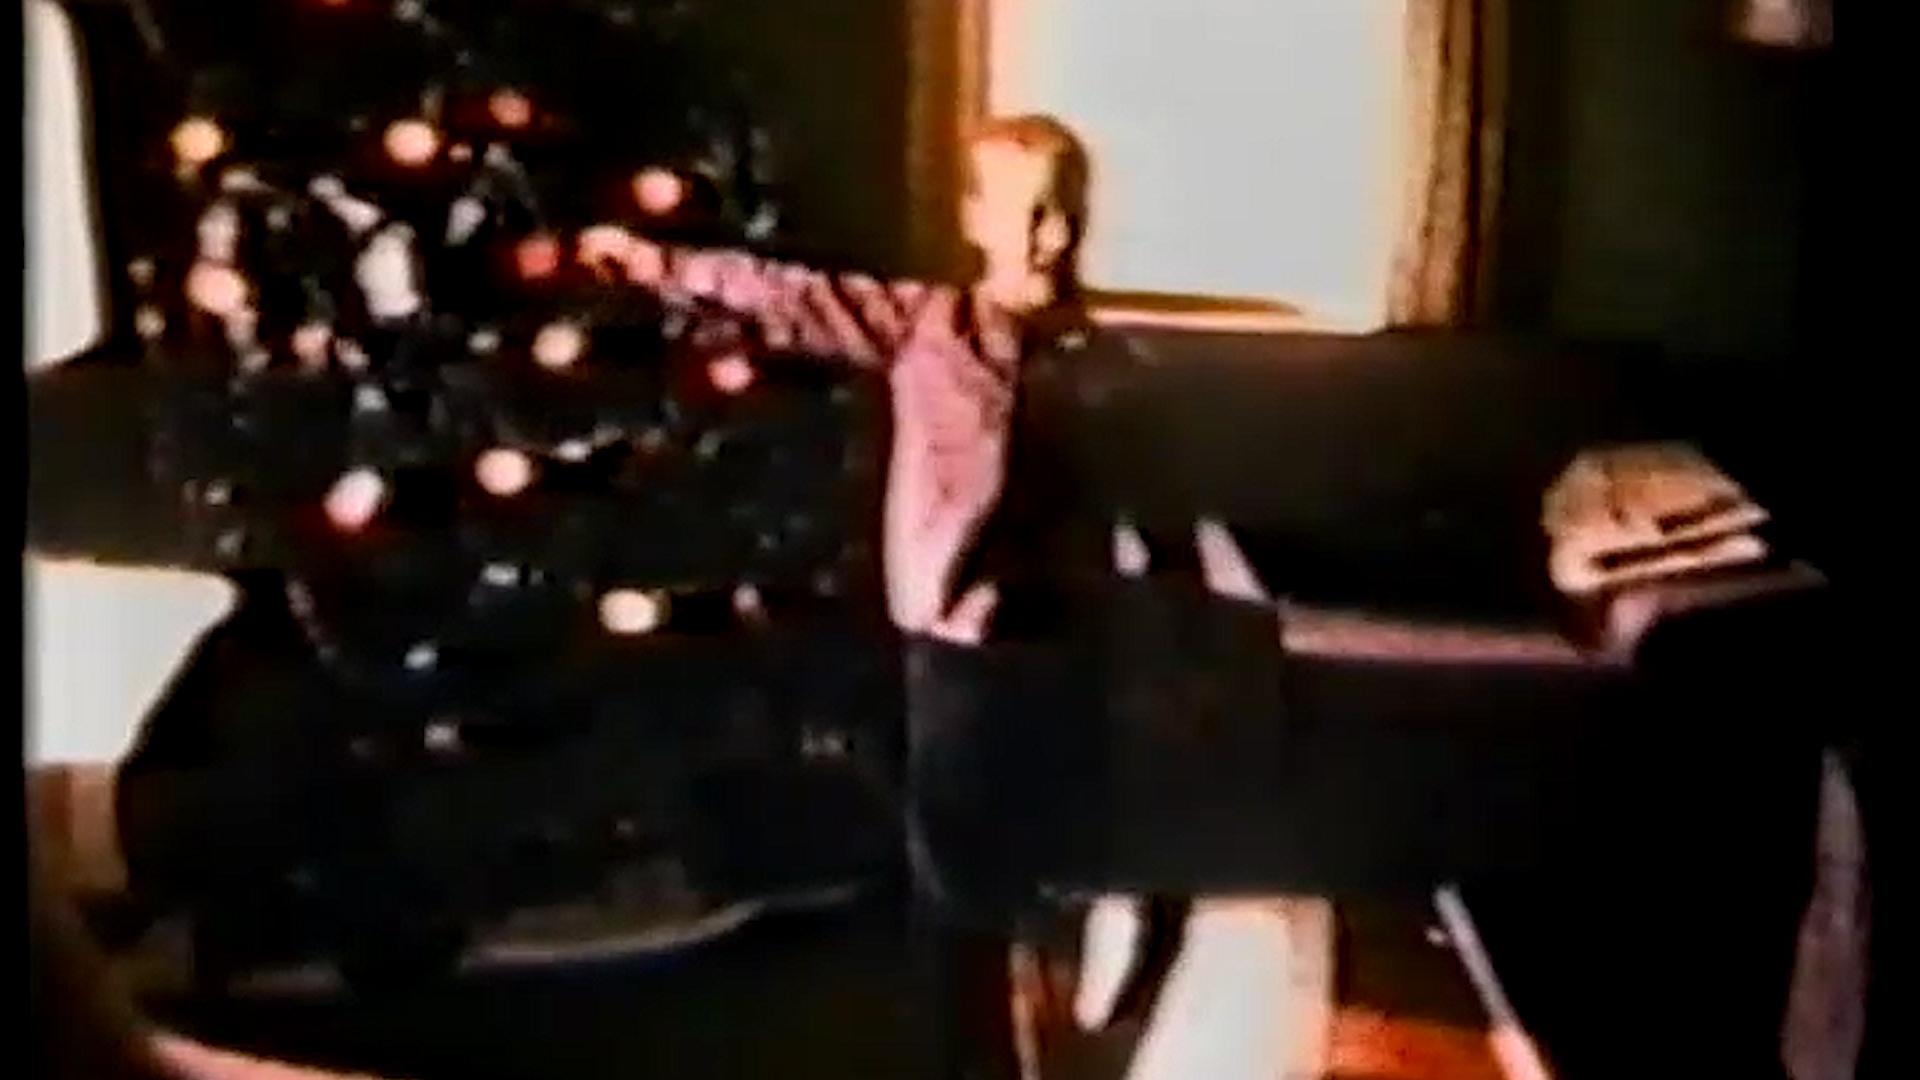 Young Ray at Christmas